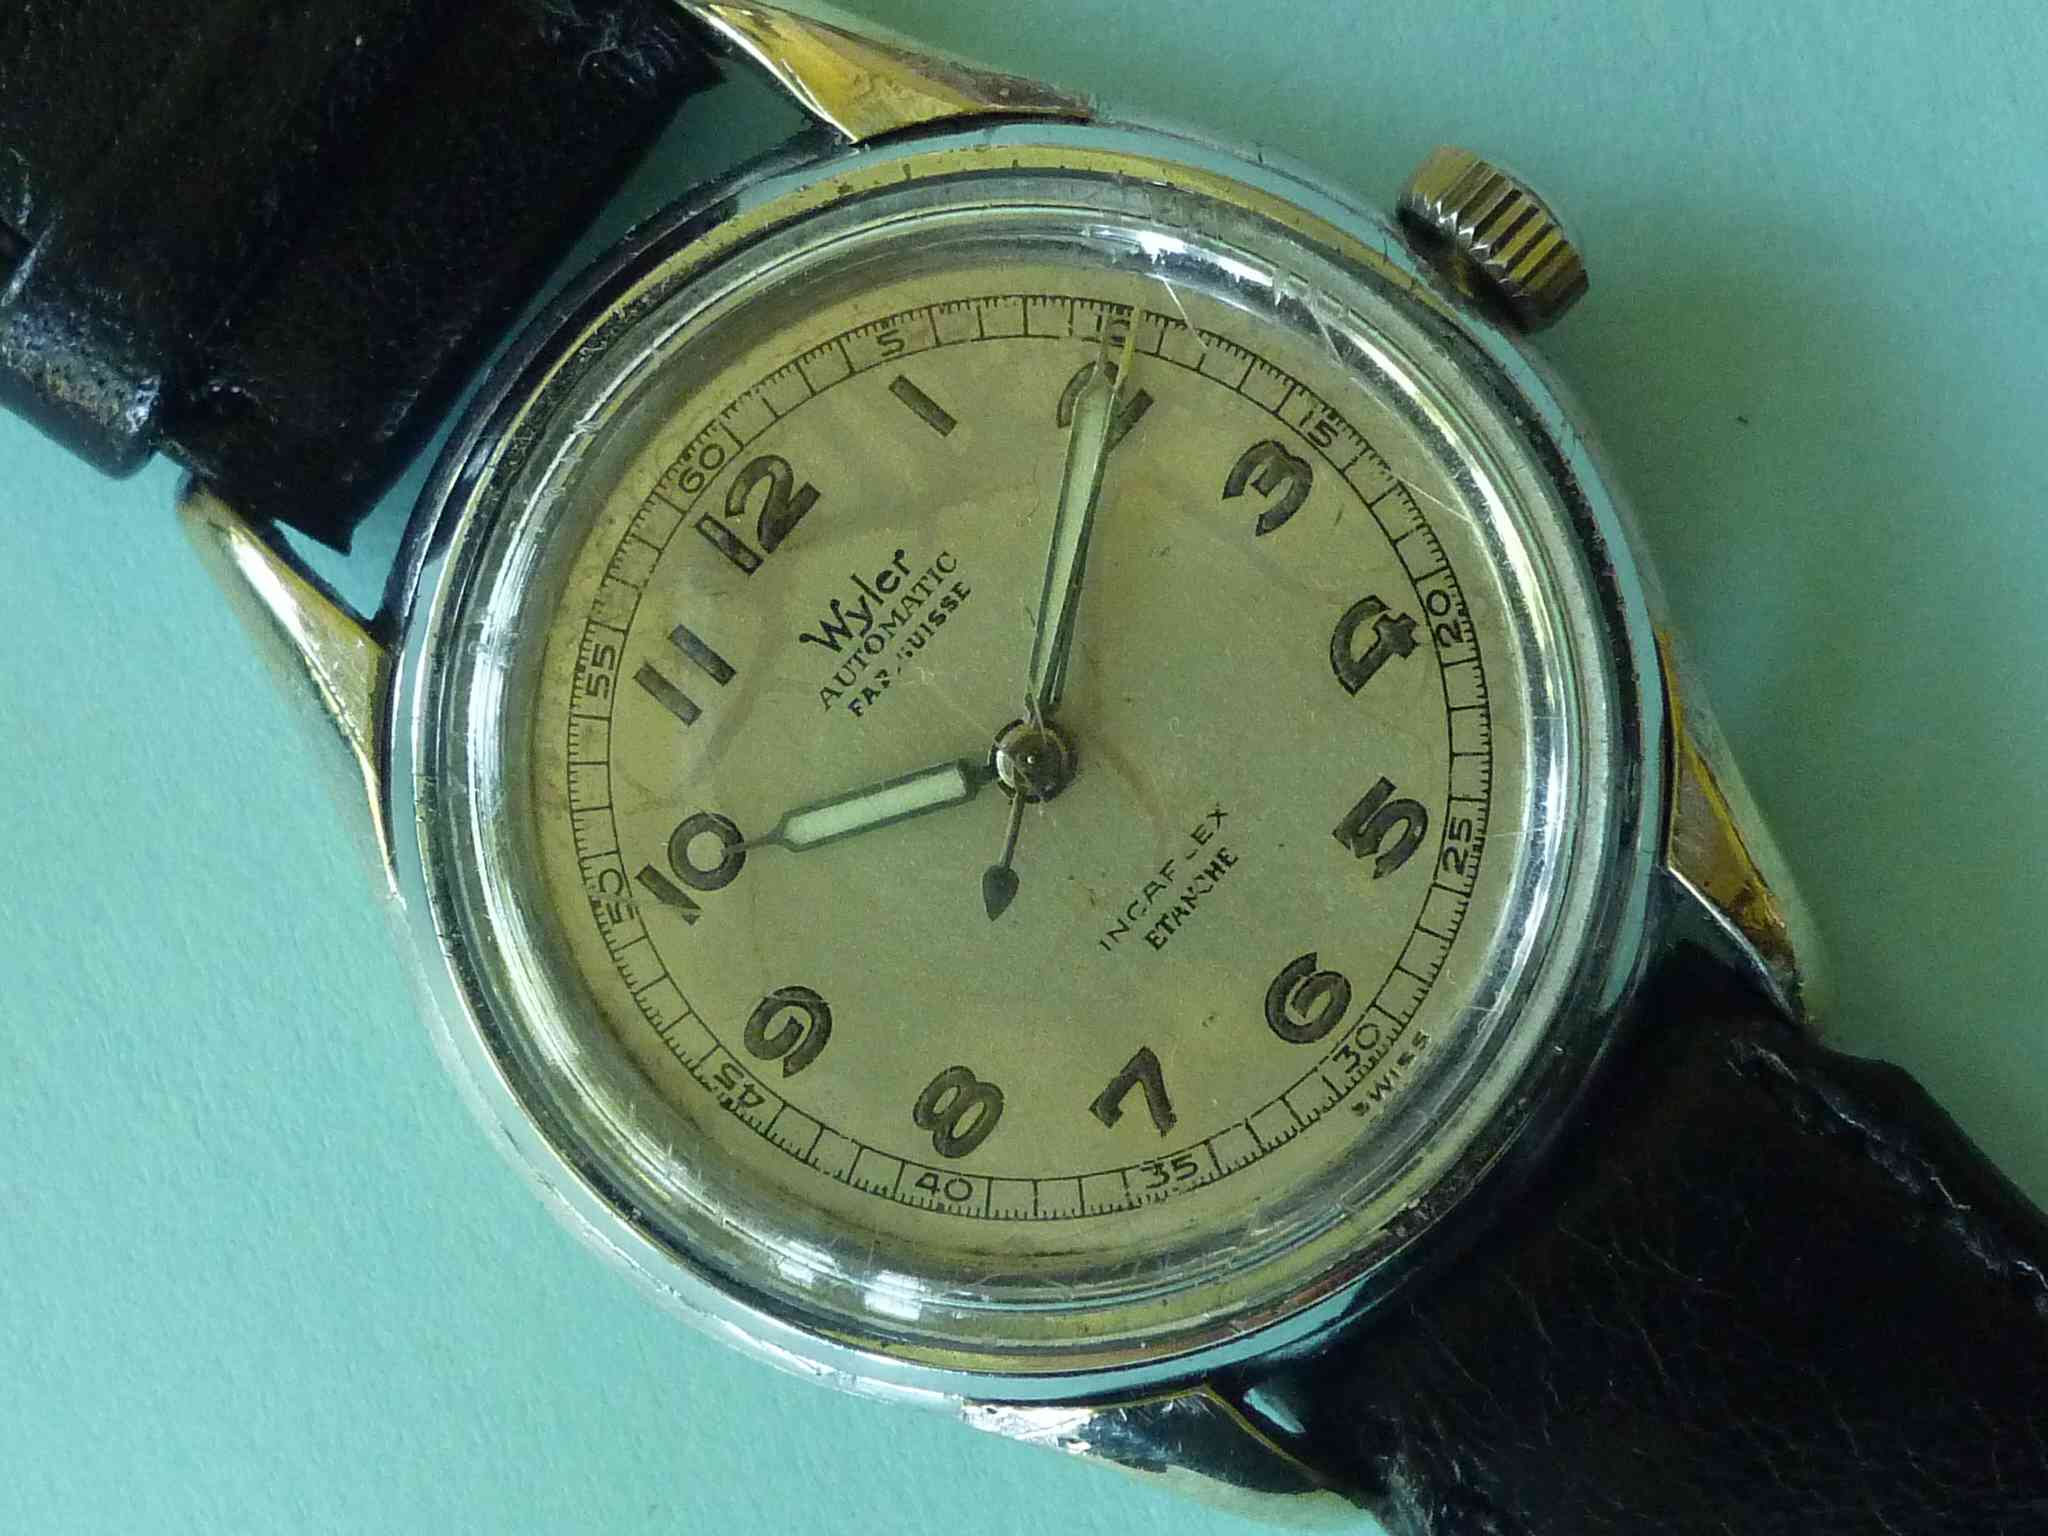 Wyler replica watches - Wyler Replica Watches 15